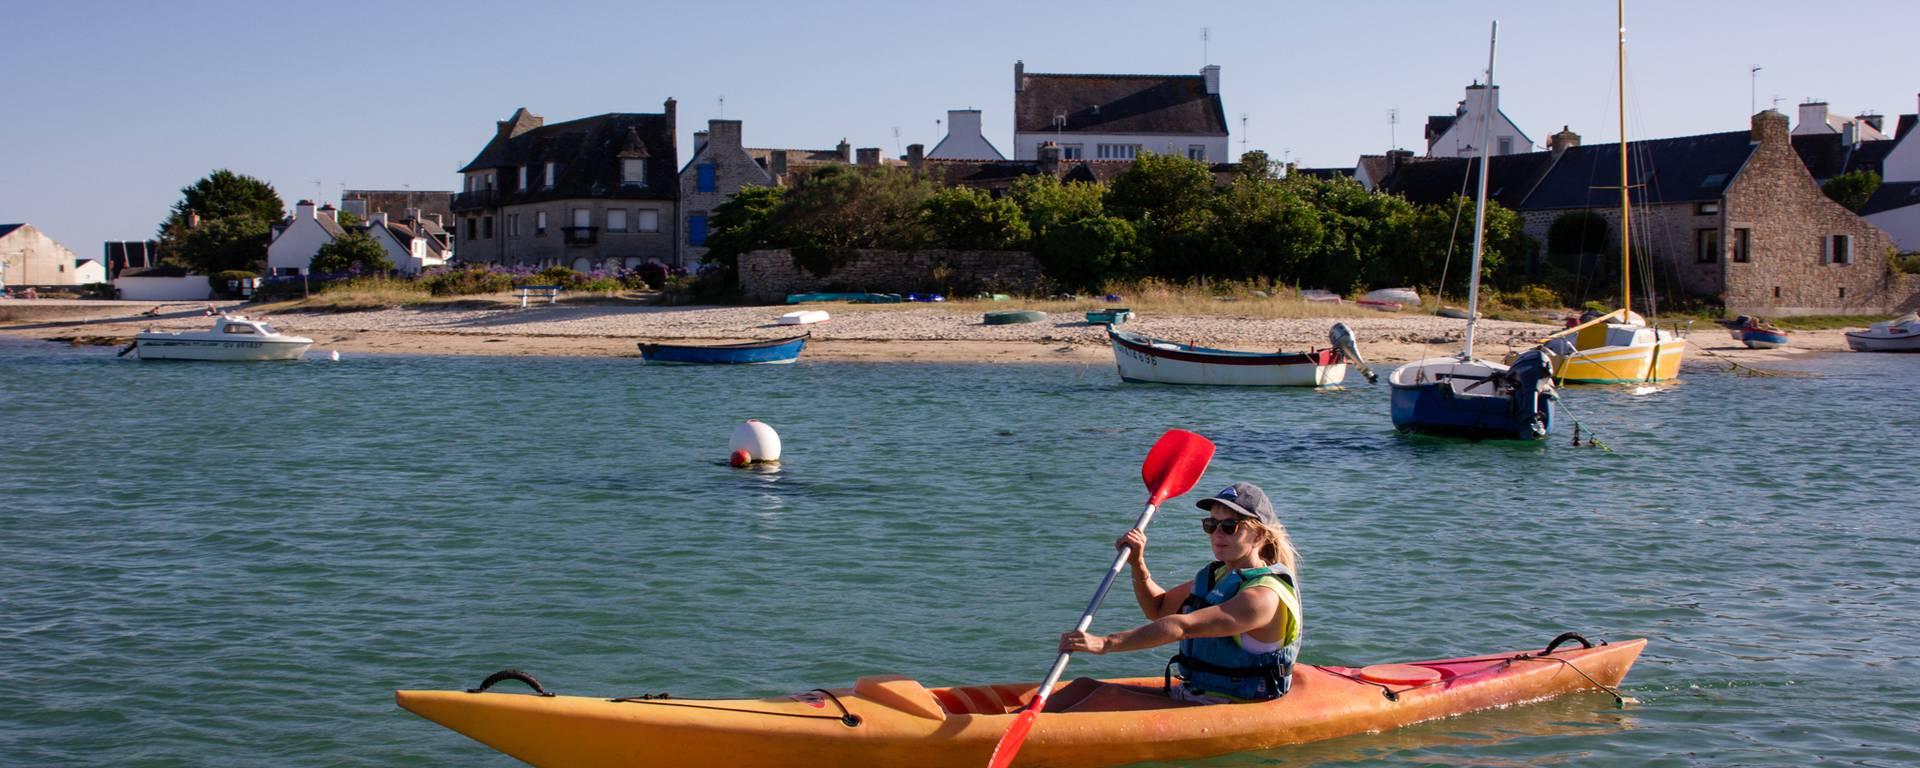 Kayak - ©L. Gloaguen